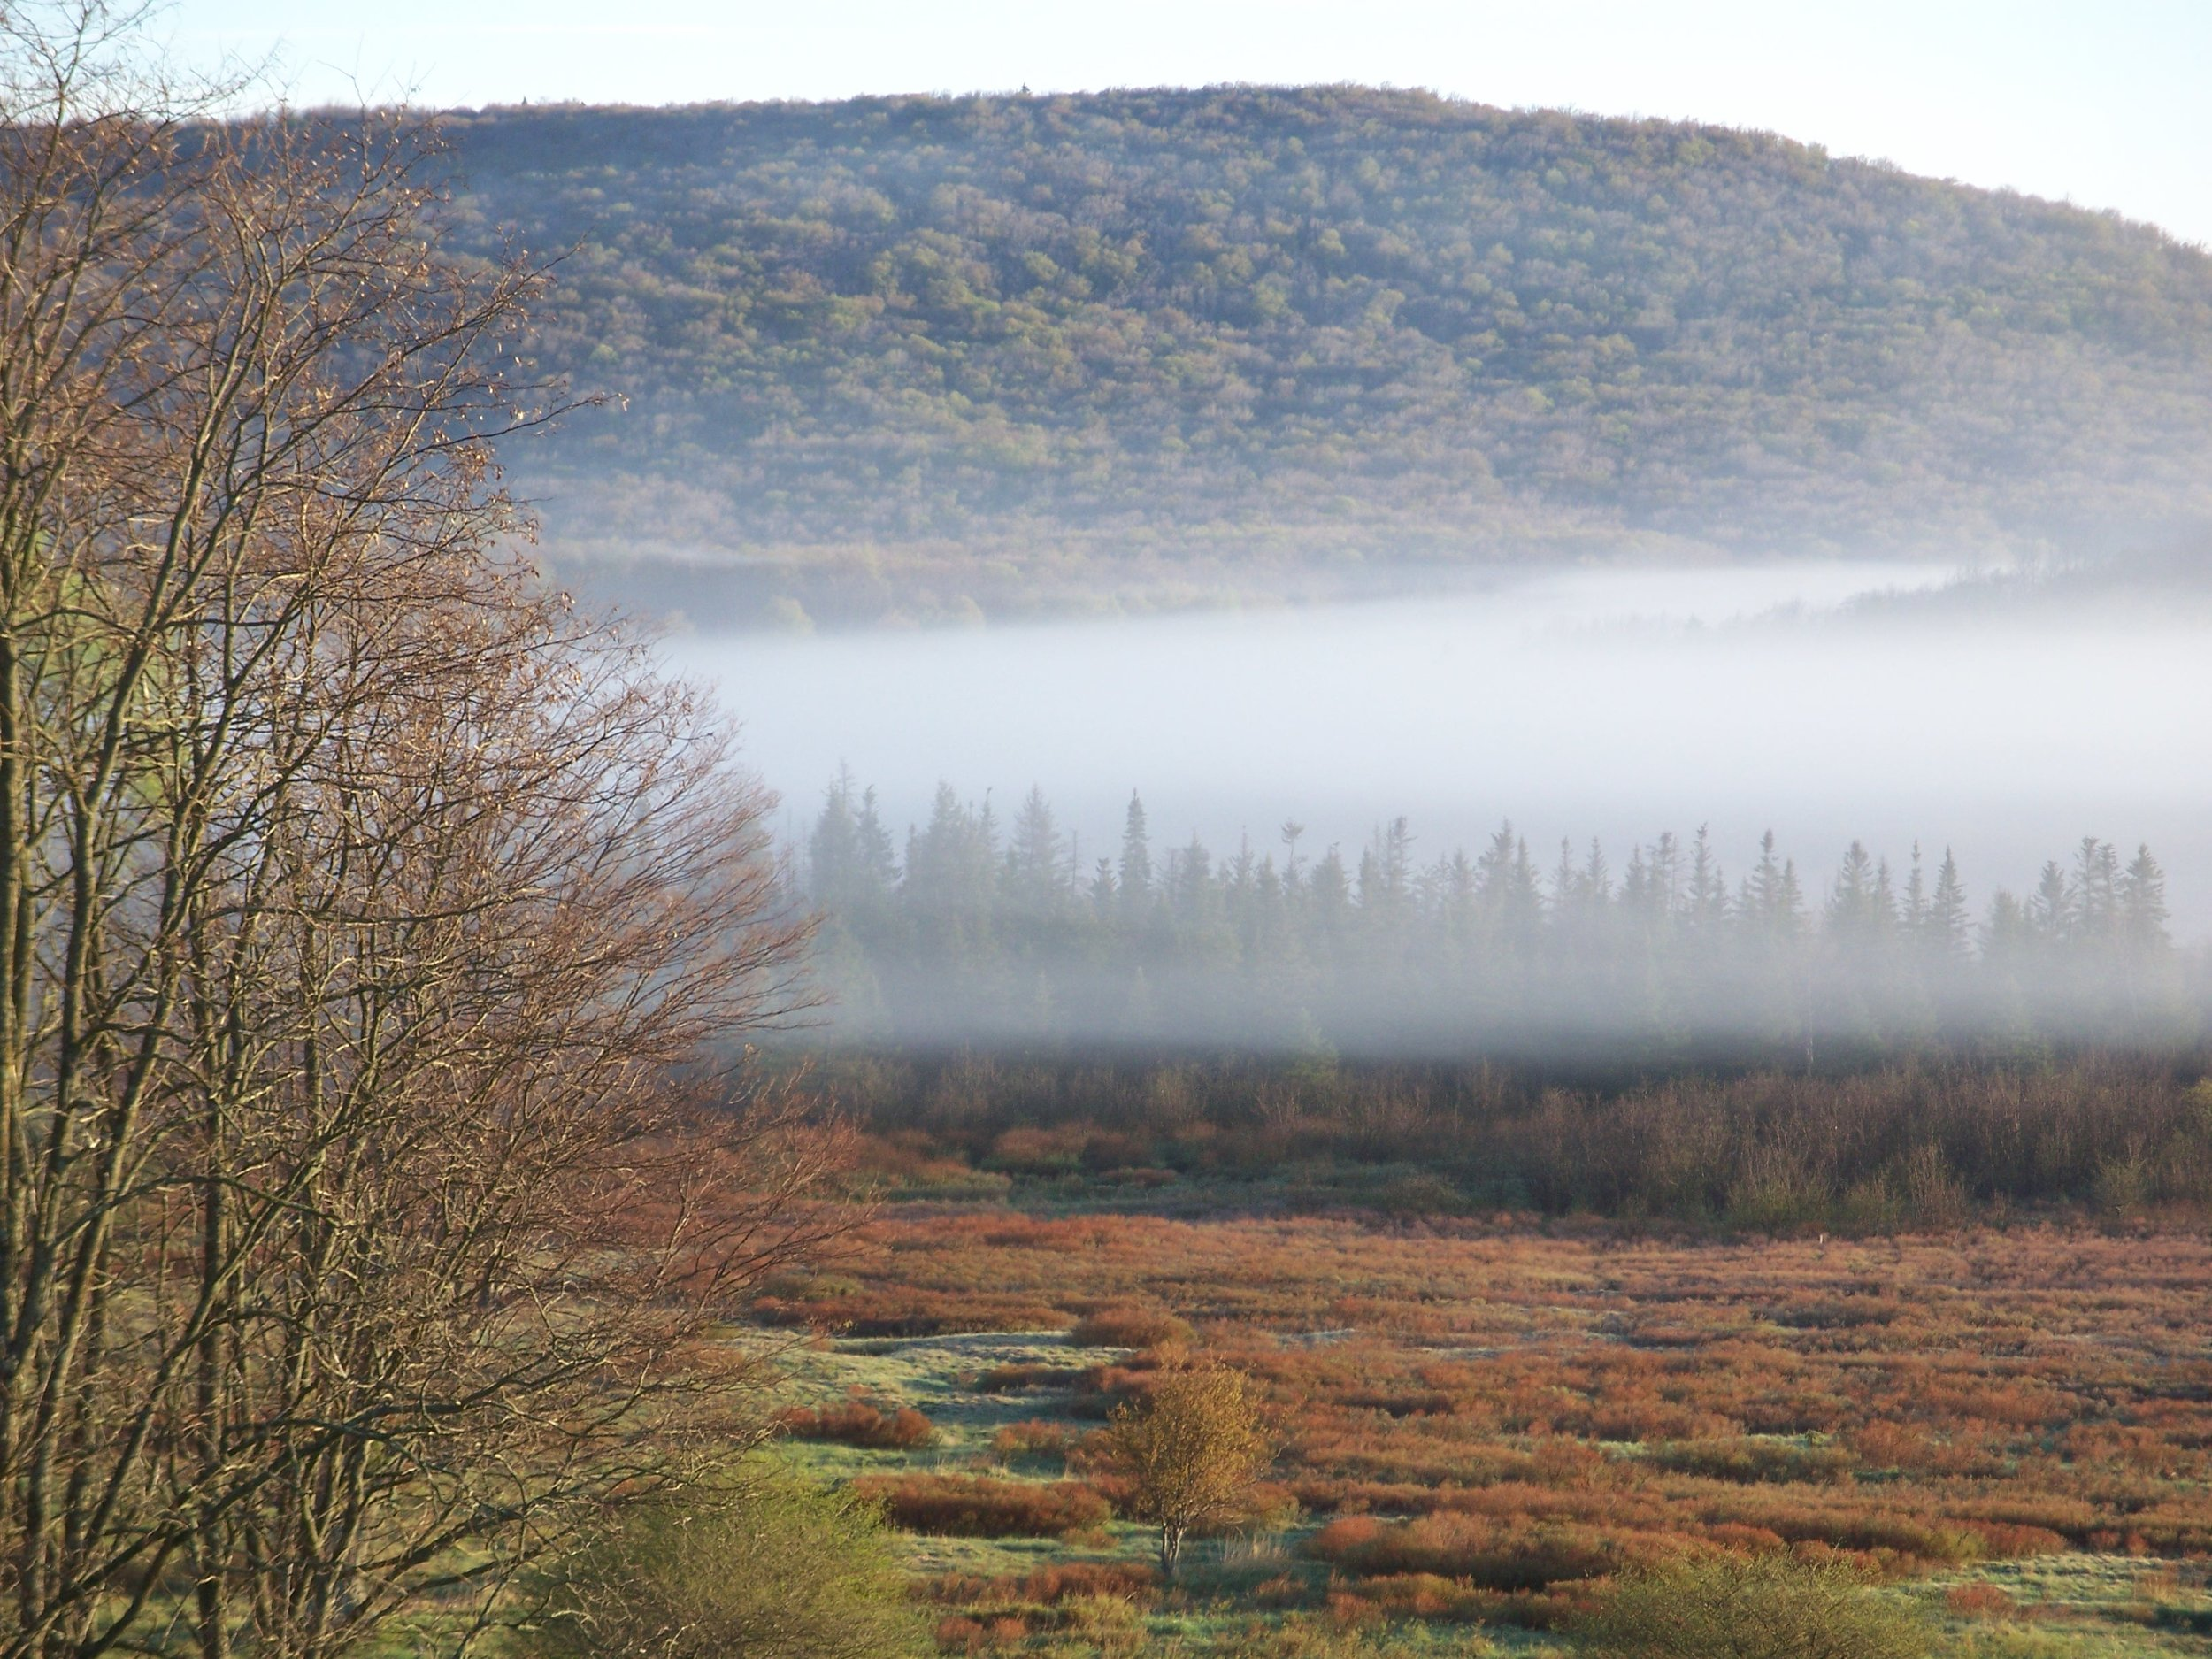 Canaan Valley near ALT - By Doug Wood